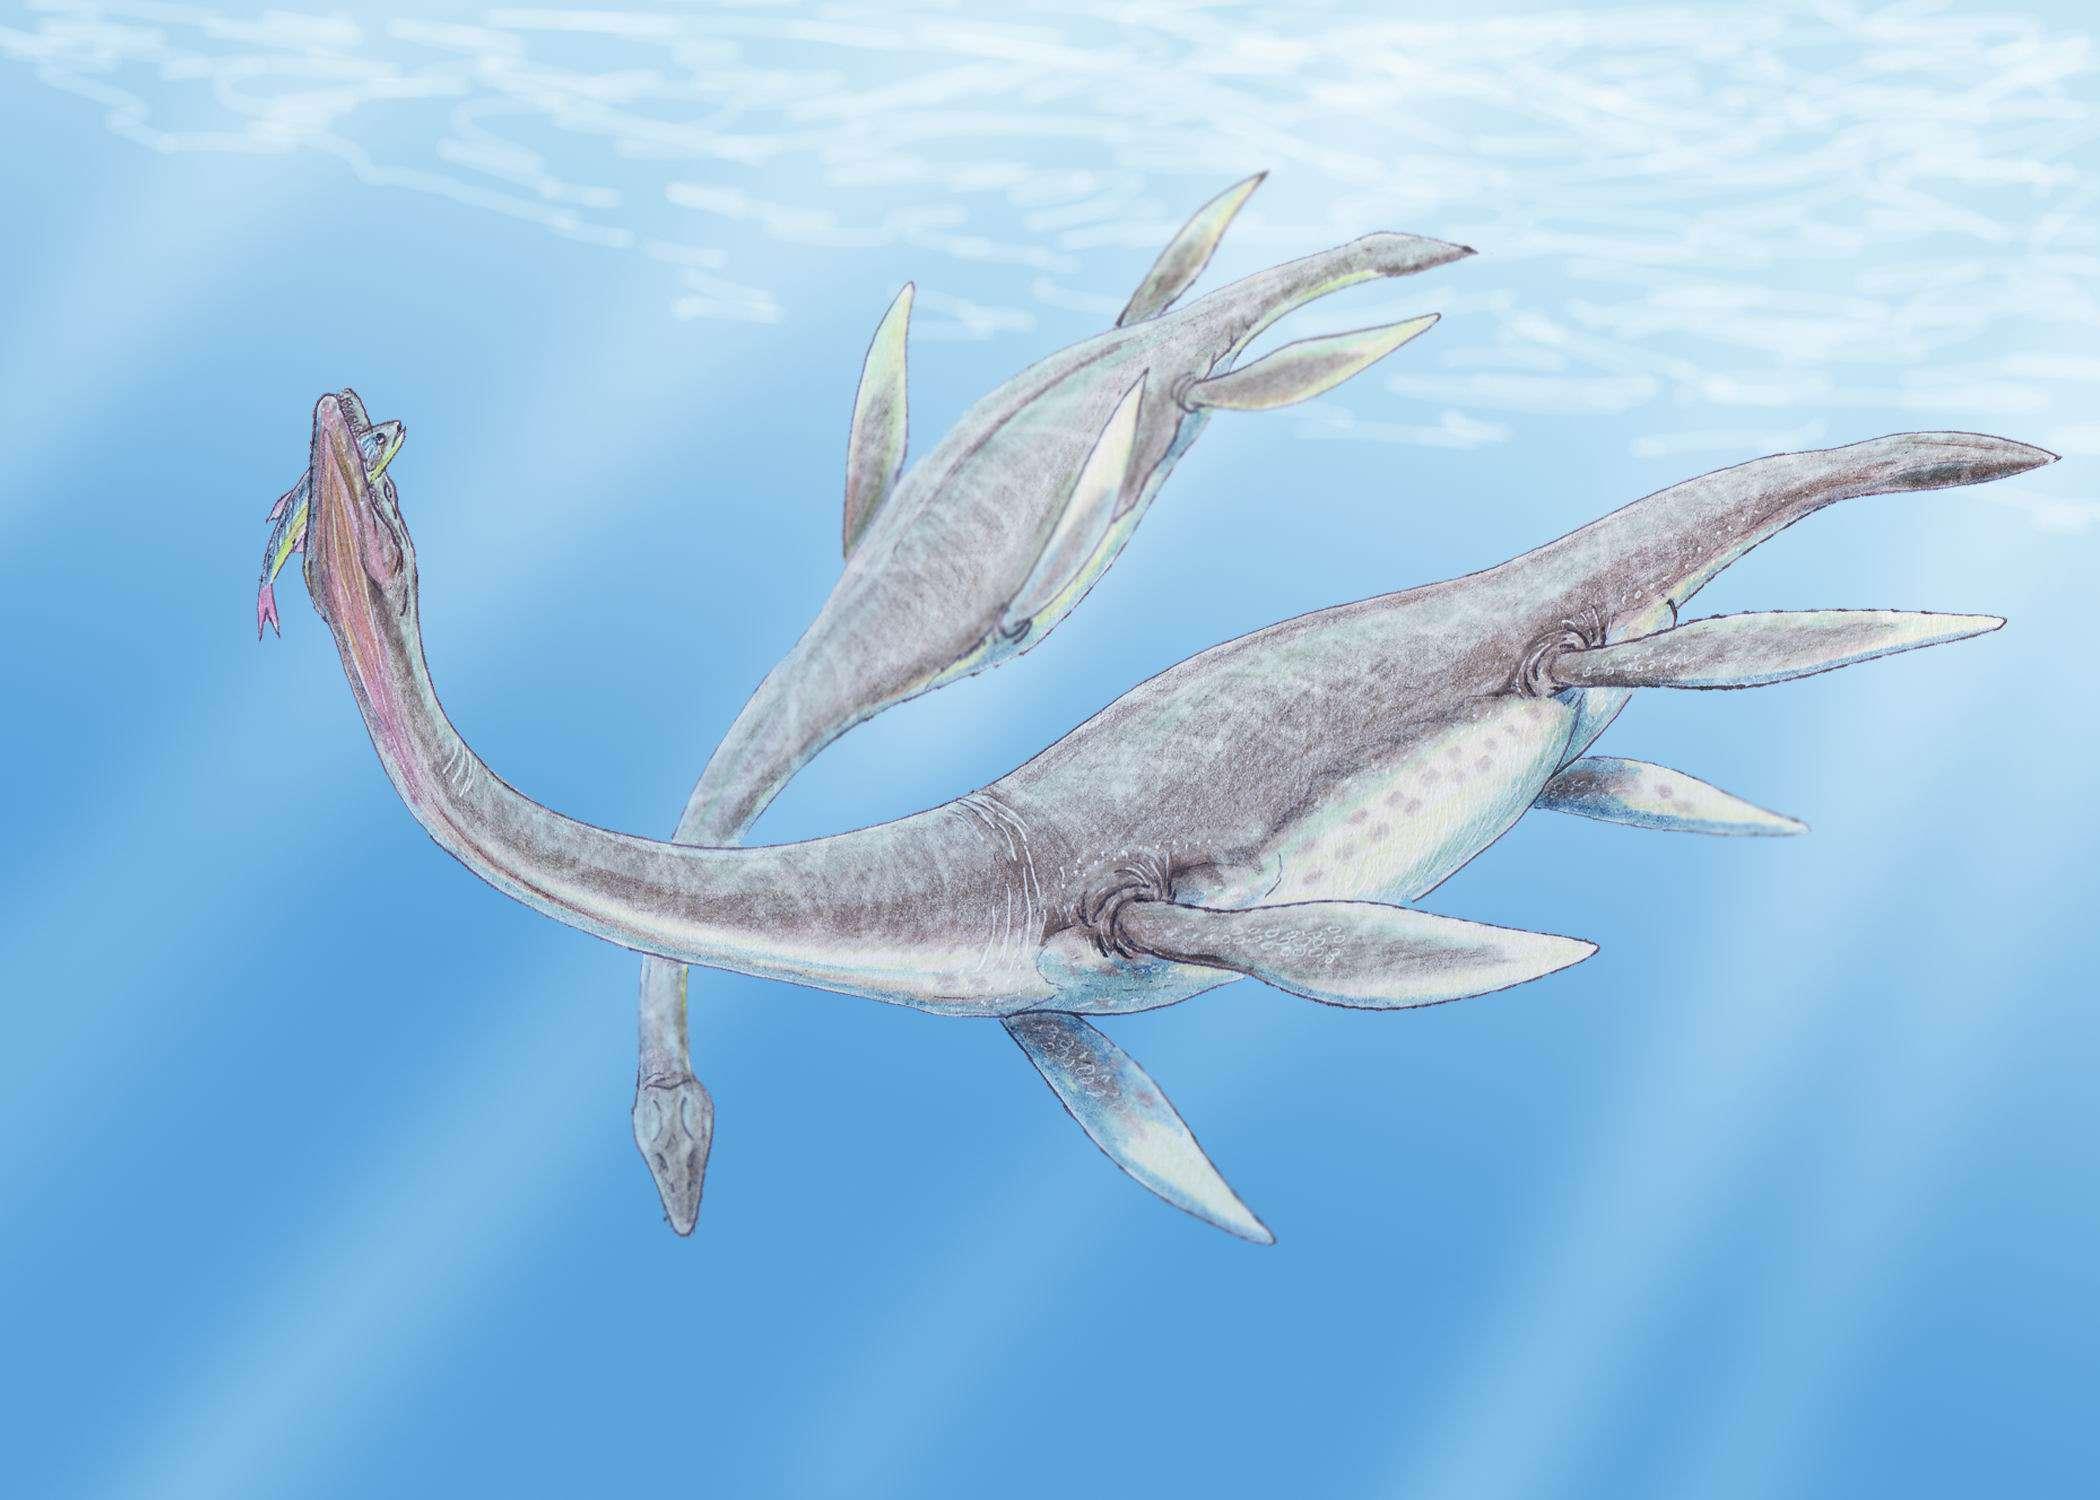 Plesiosaurus dolichodeirus